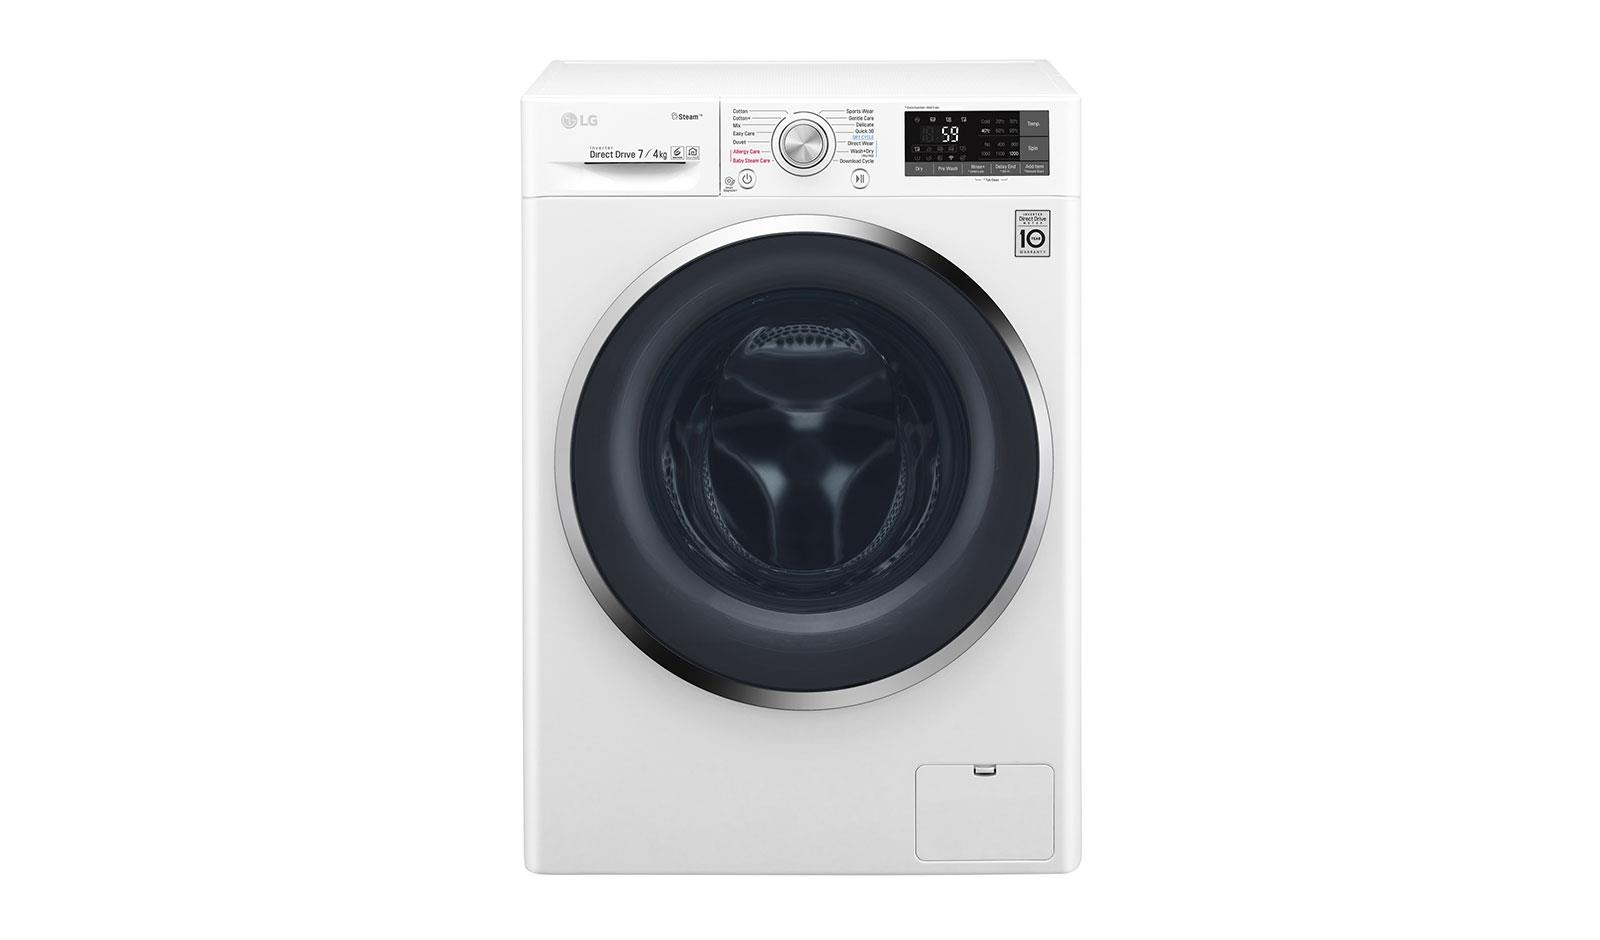 Washer-dryer LG F2J7HG2W (1200 rpm; 7 kg; 450 mm) AGDLG-SUW0002 Veļas žāvētājs